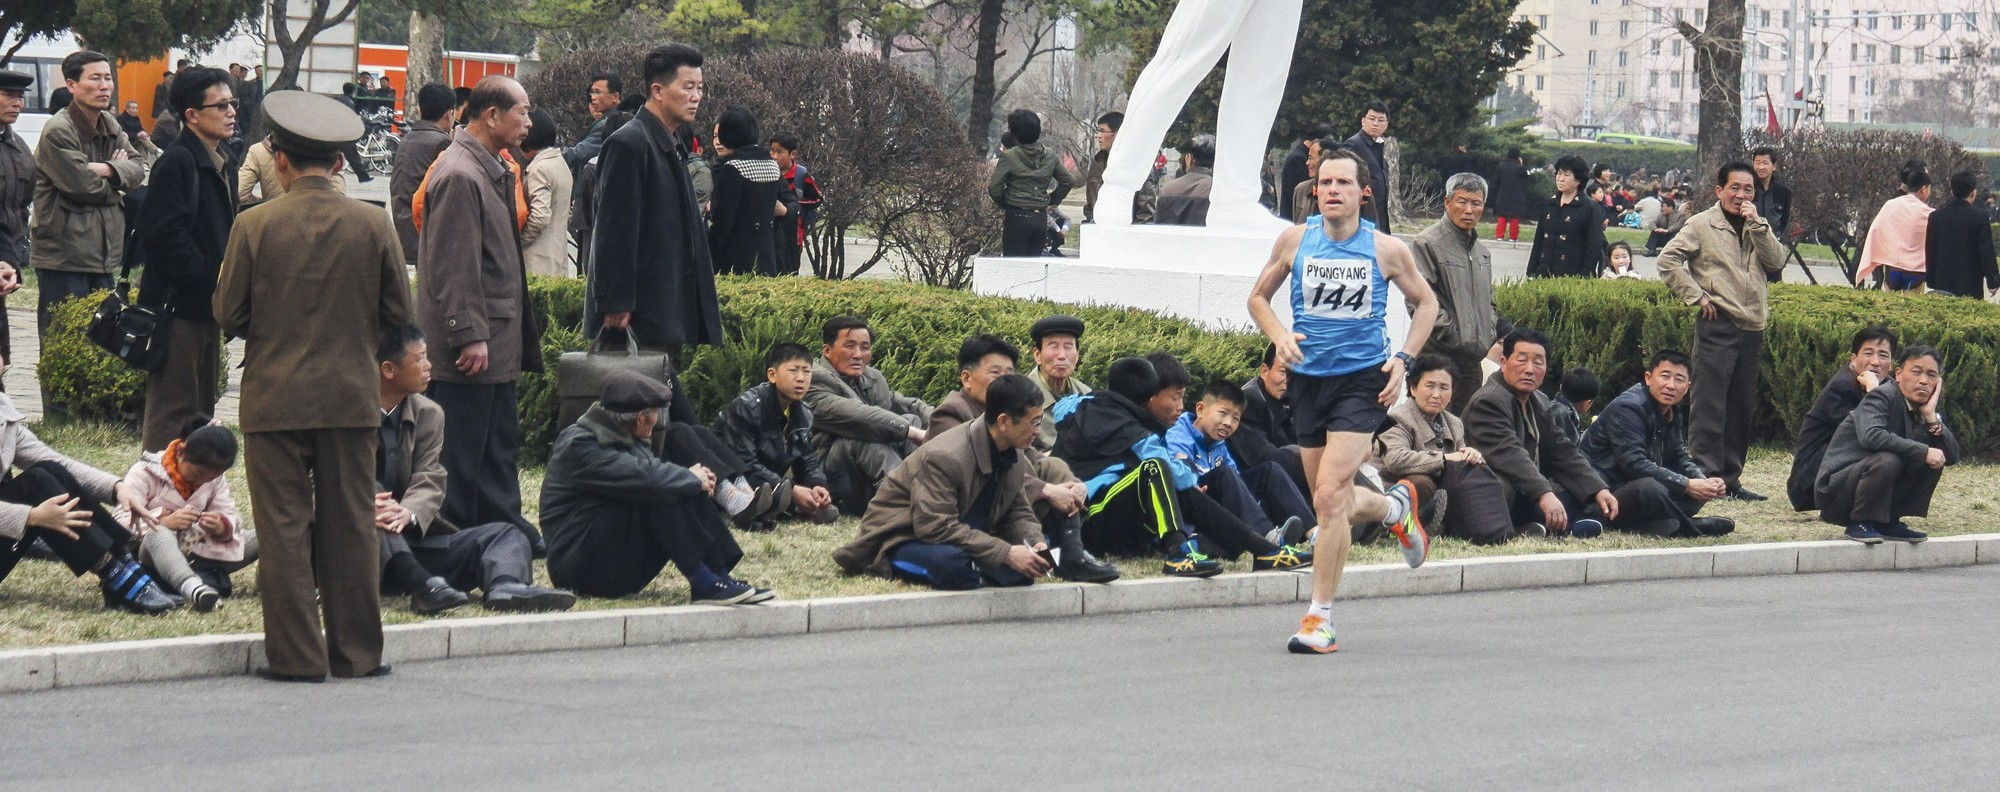 Gething runs the North Korea Marathon. Picture: David Gething